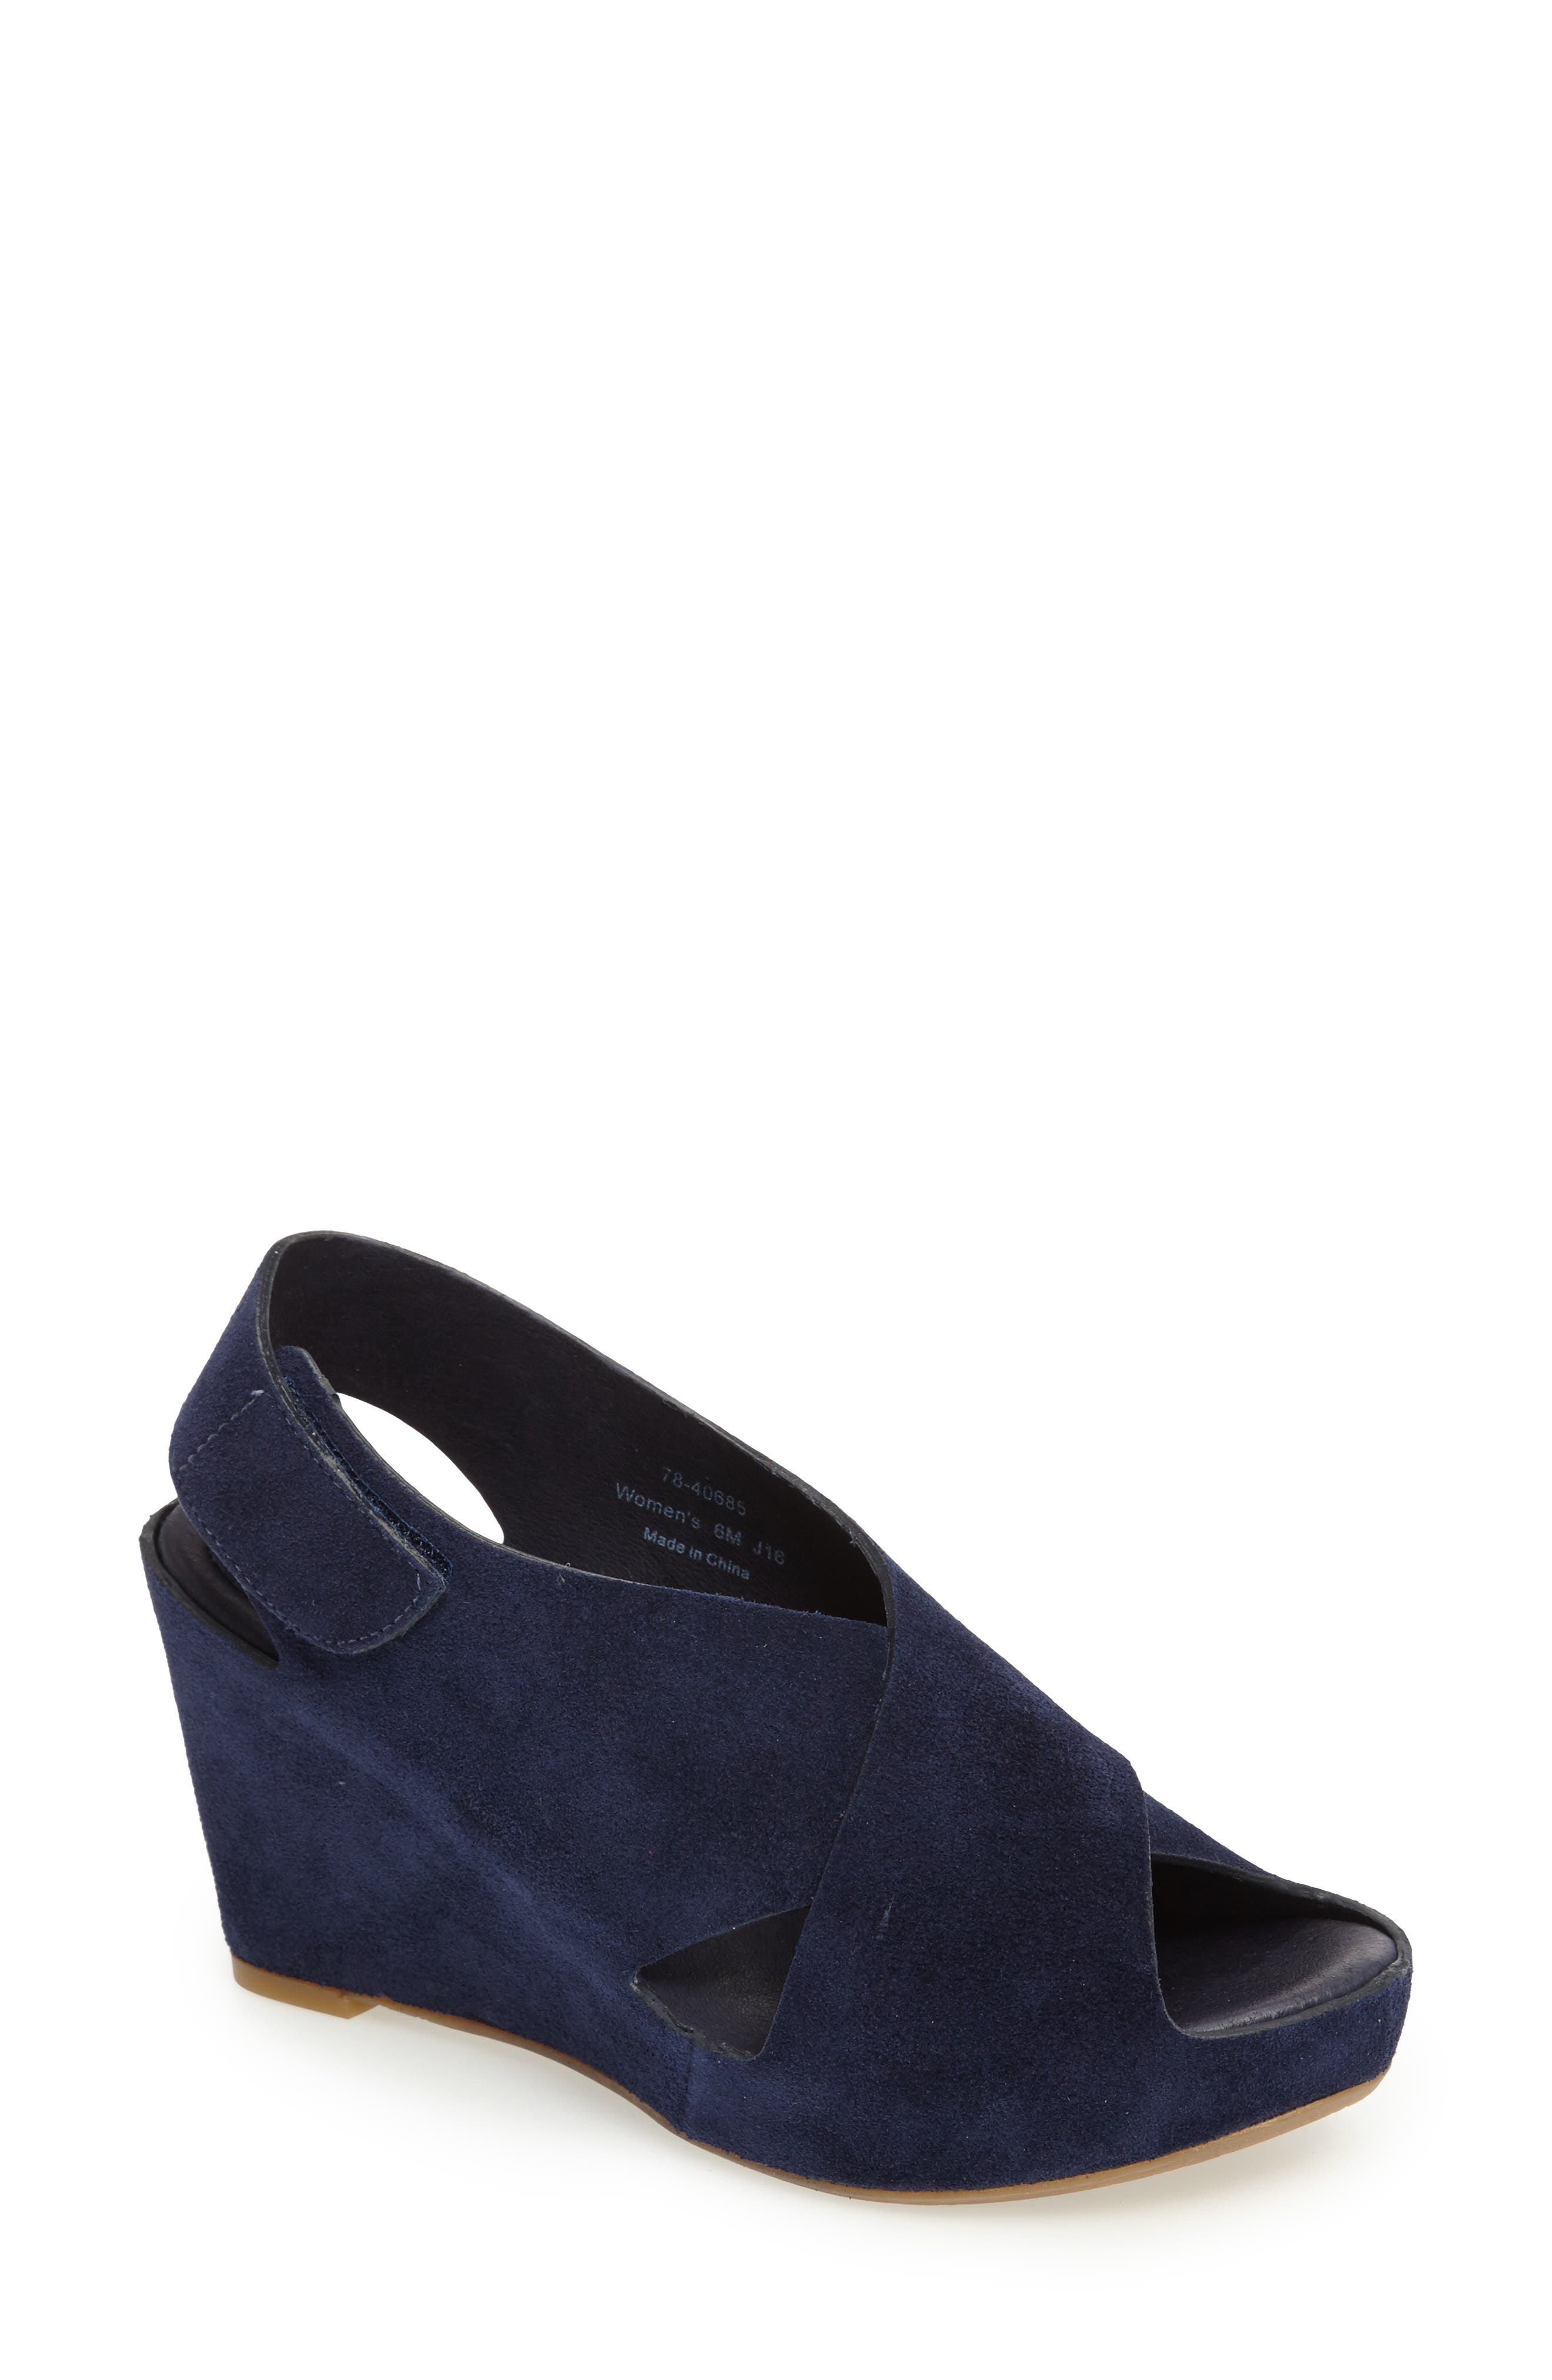 Johnston & Murphy 'Tori' Wedge Sandal (Women)